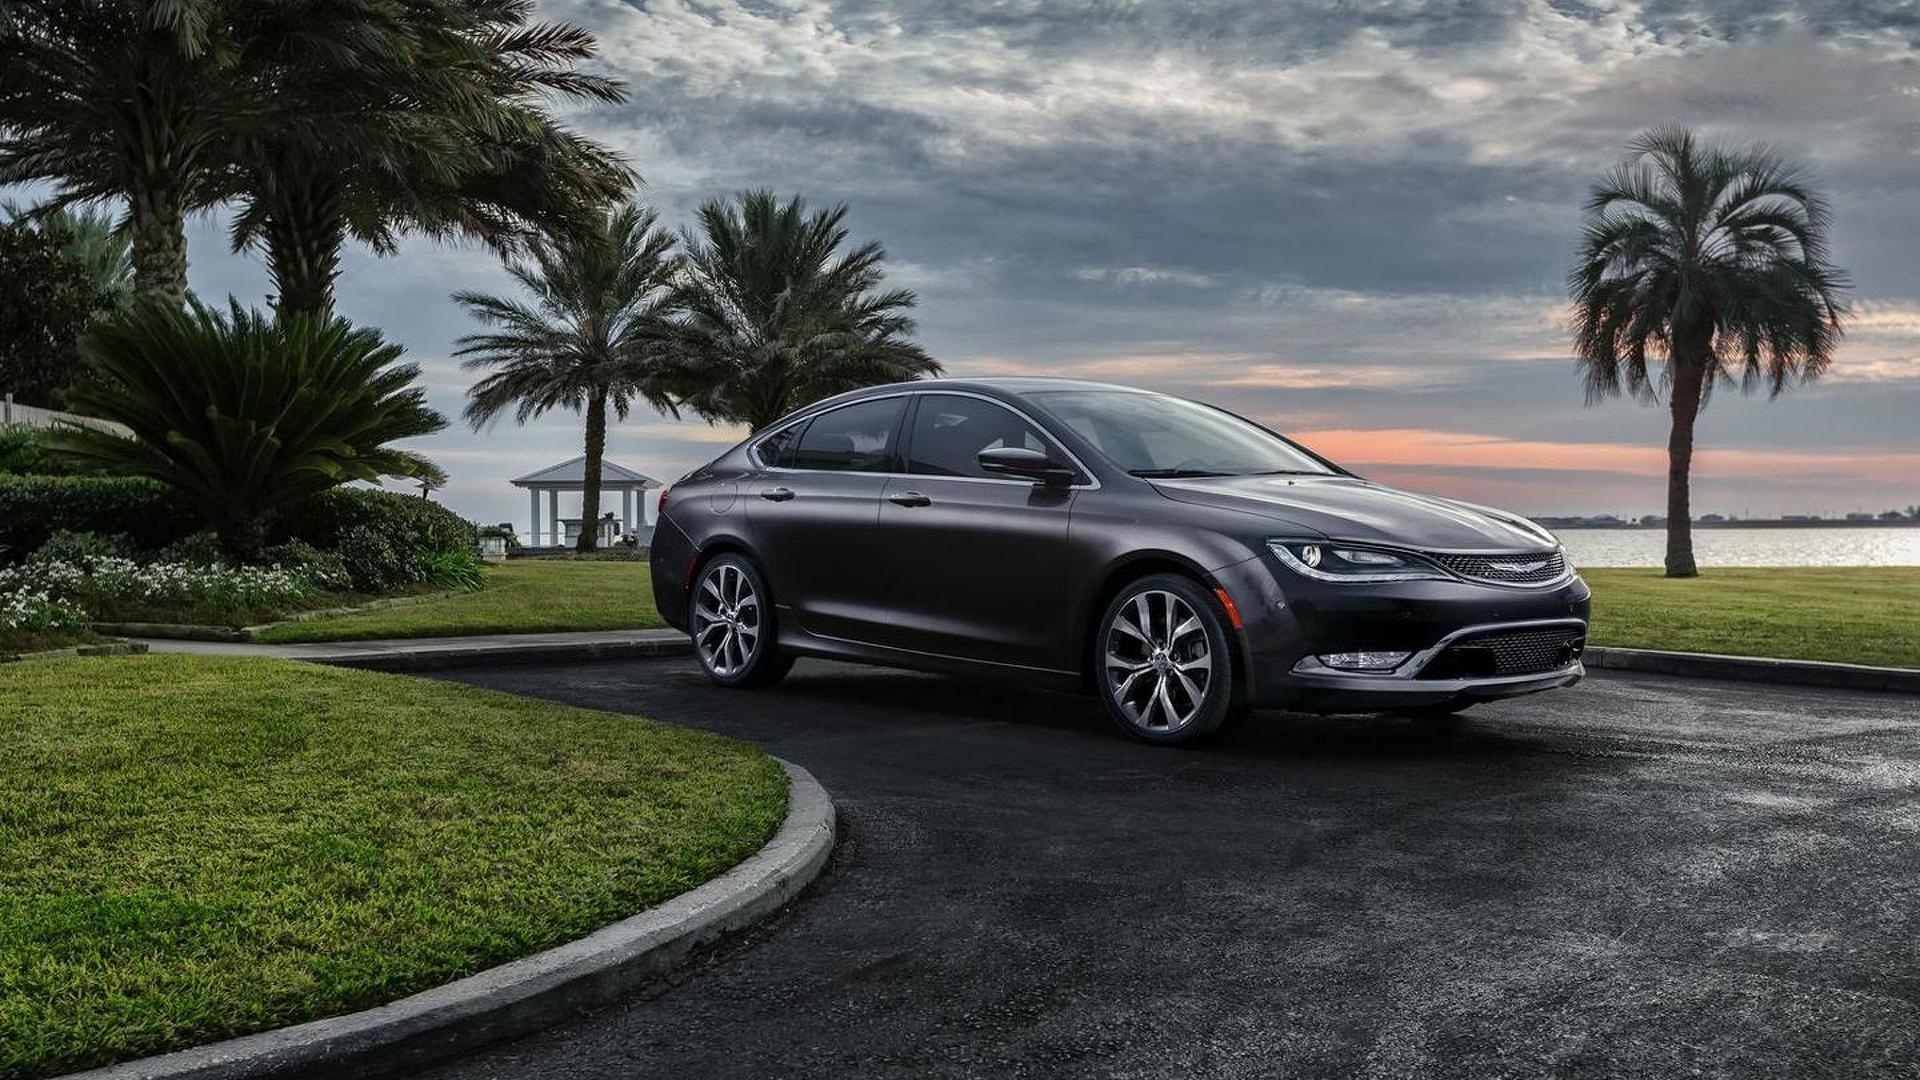 FCA in talks with partner to build Chrysler 200 & Dodge Dart successors